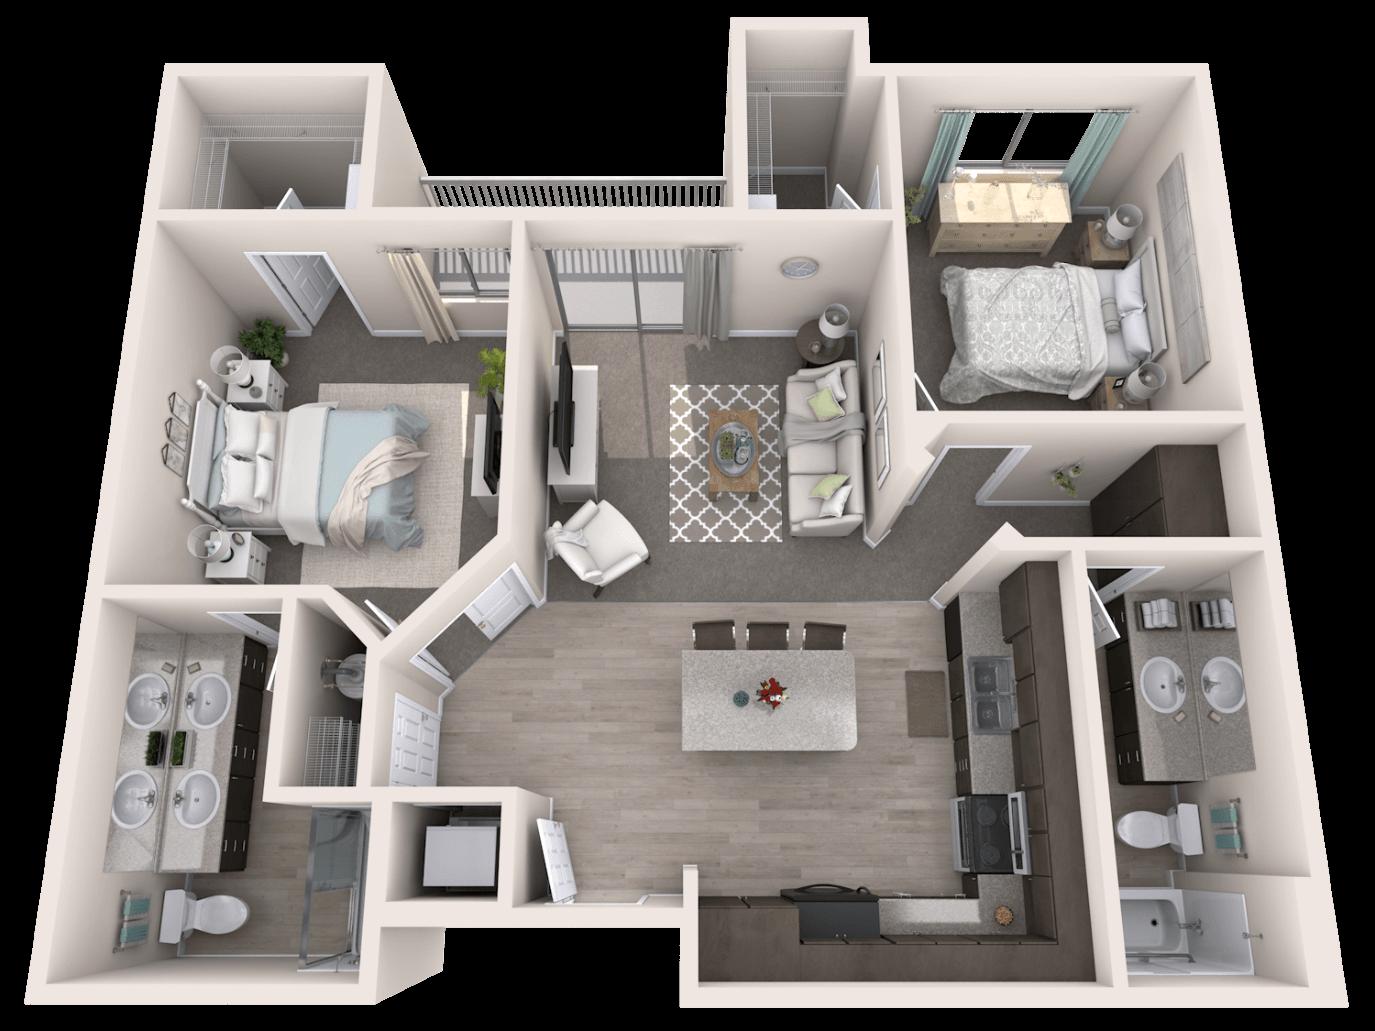 3d Floor Plans House Layout Plans Sims House Design Small House Plans